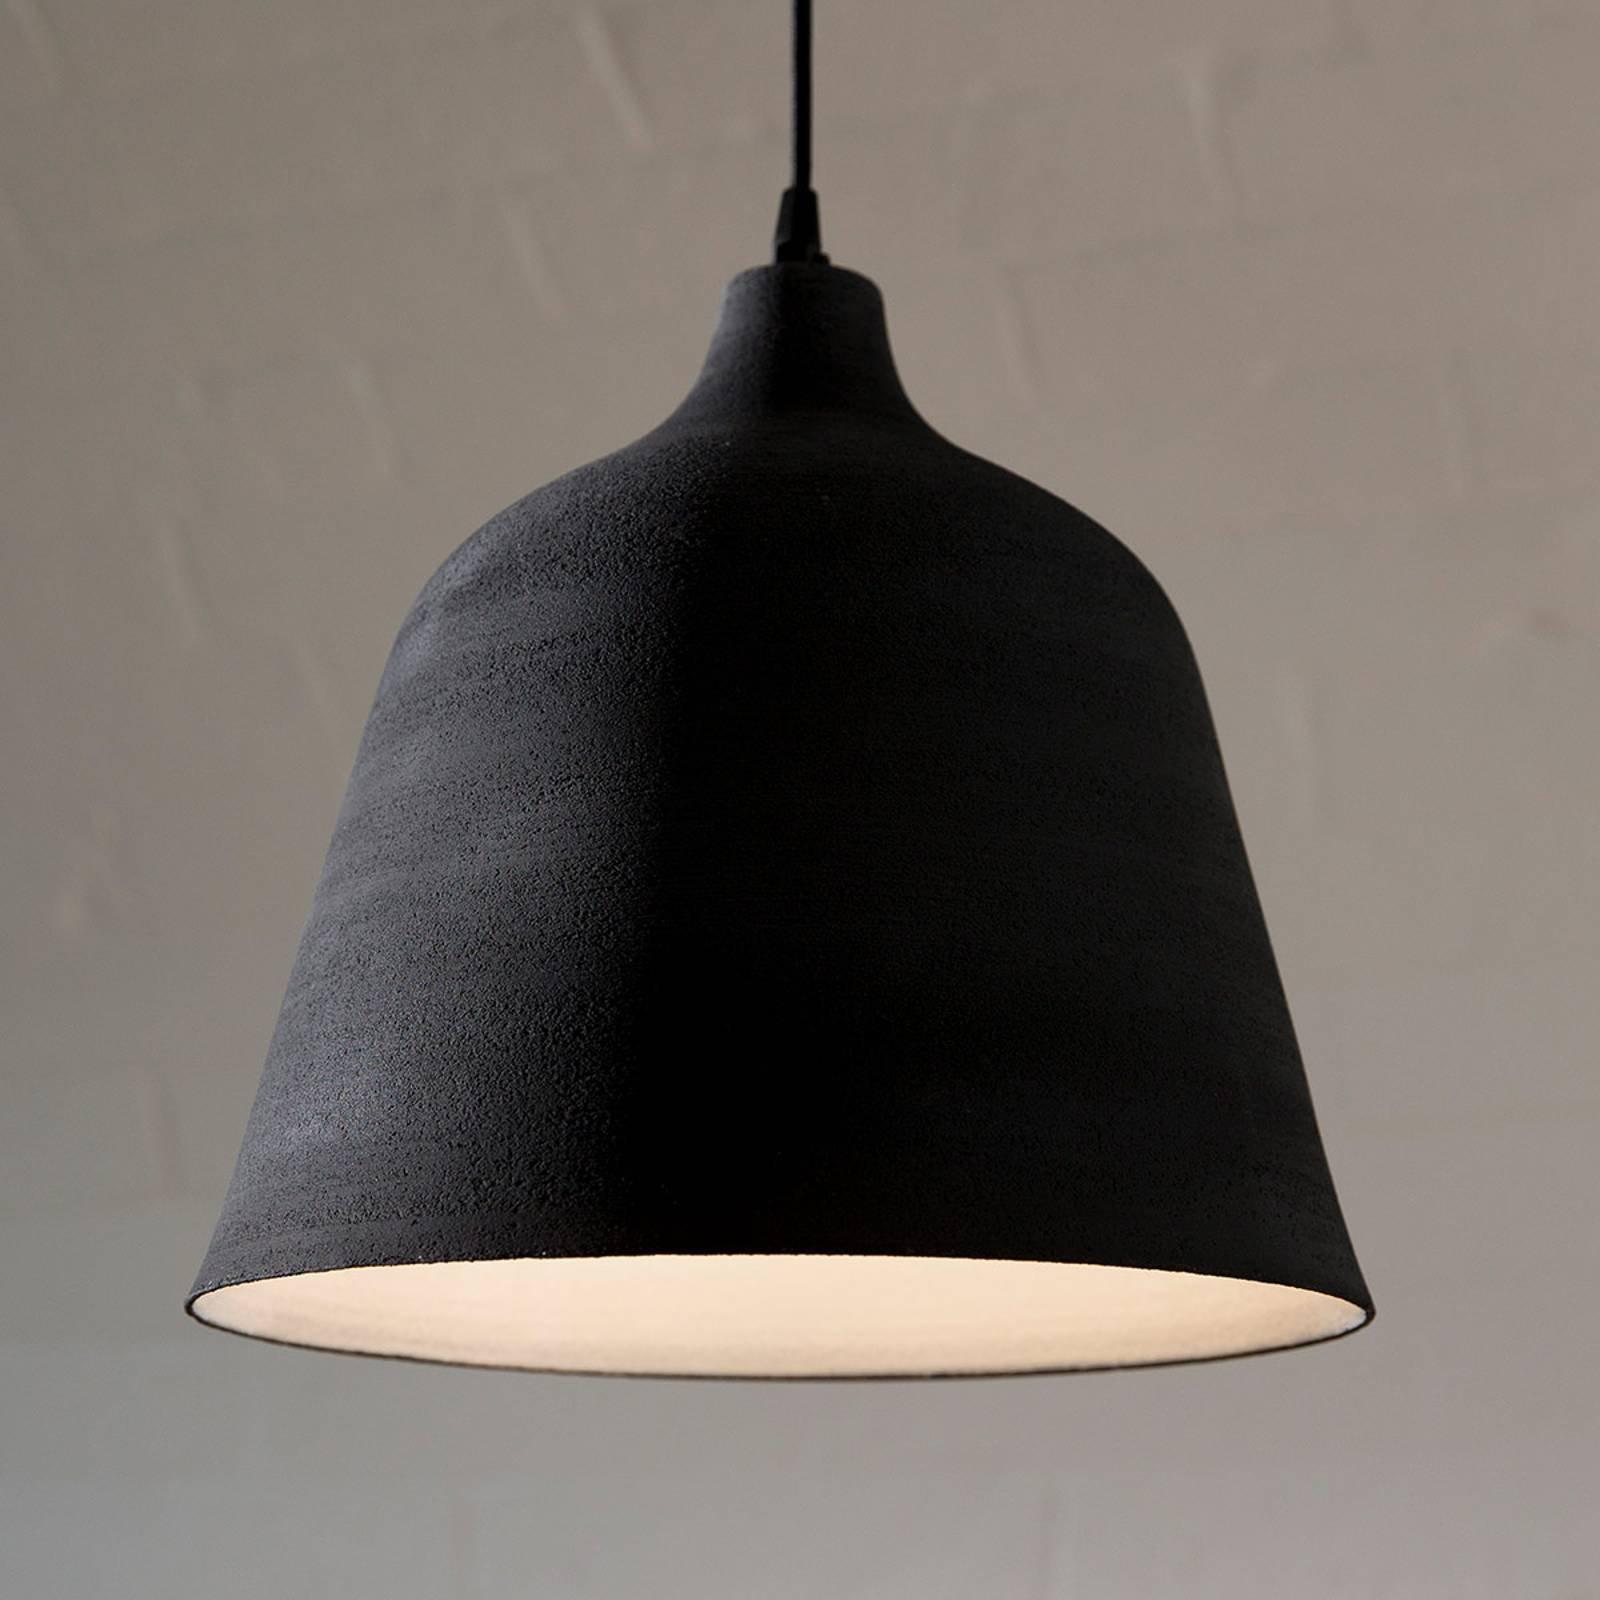 Karman T-Black - designer-hengelampe, 31 cm